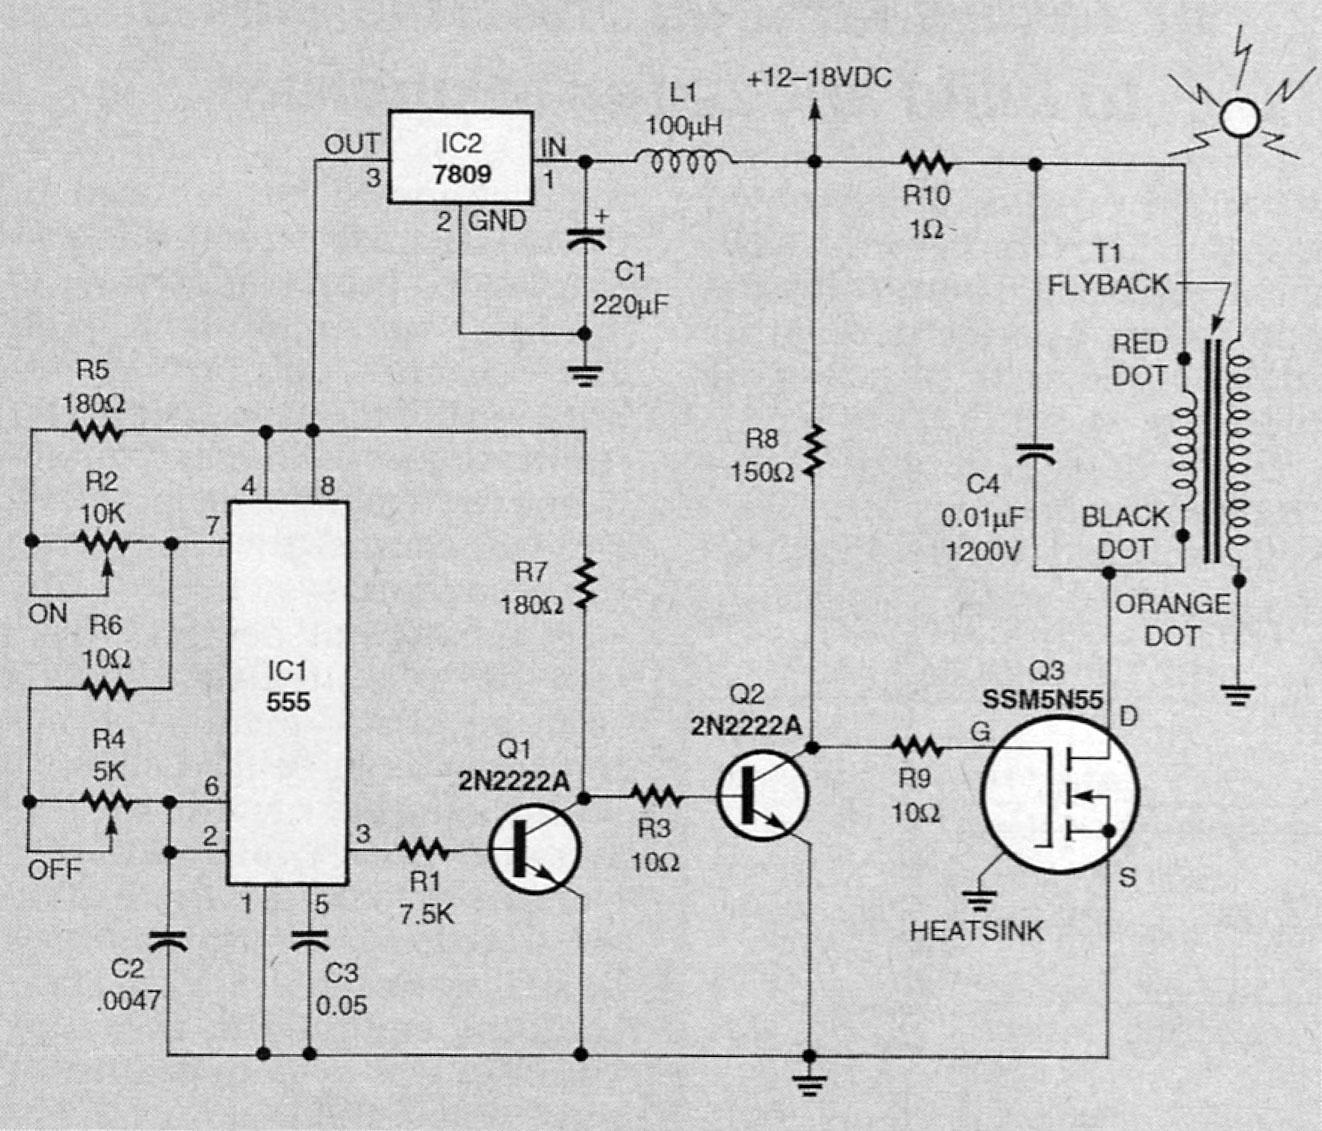 small resolution of stun gun circuit diagram furthermore high voltage generator circuit coil gun diagram furthermore high voltage power supply schematic